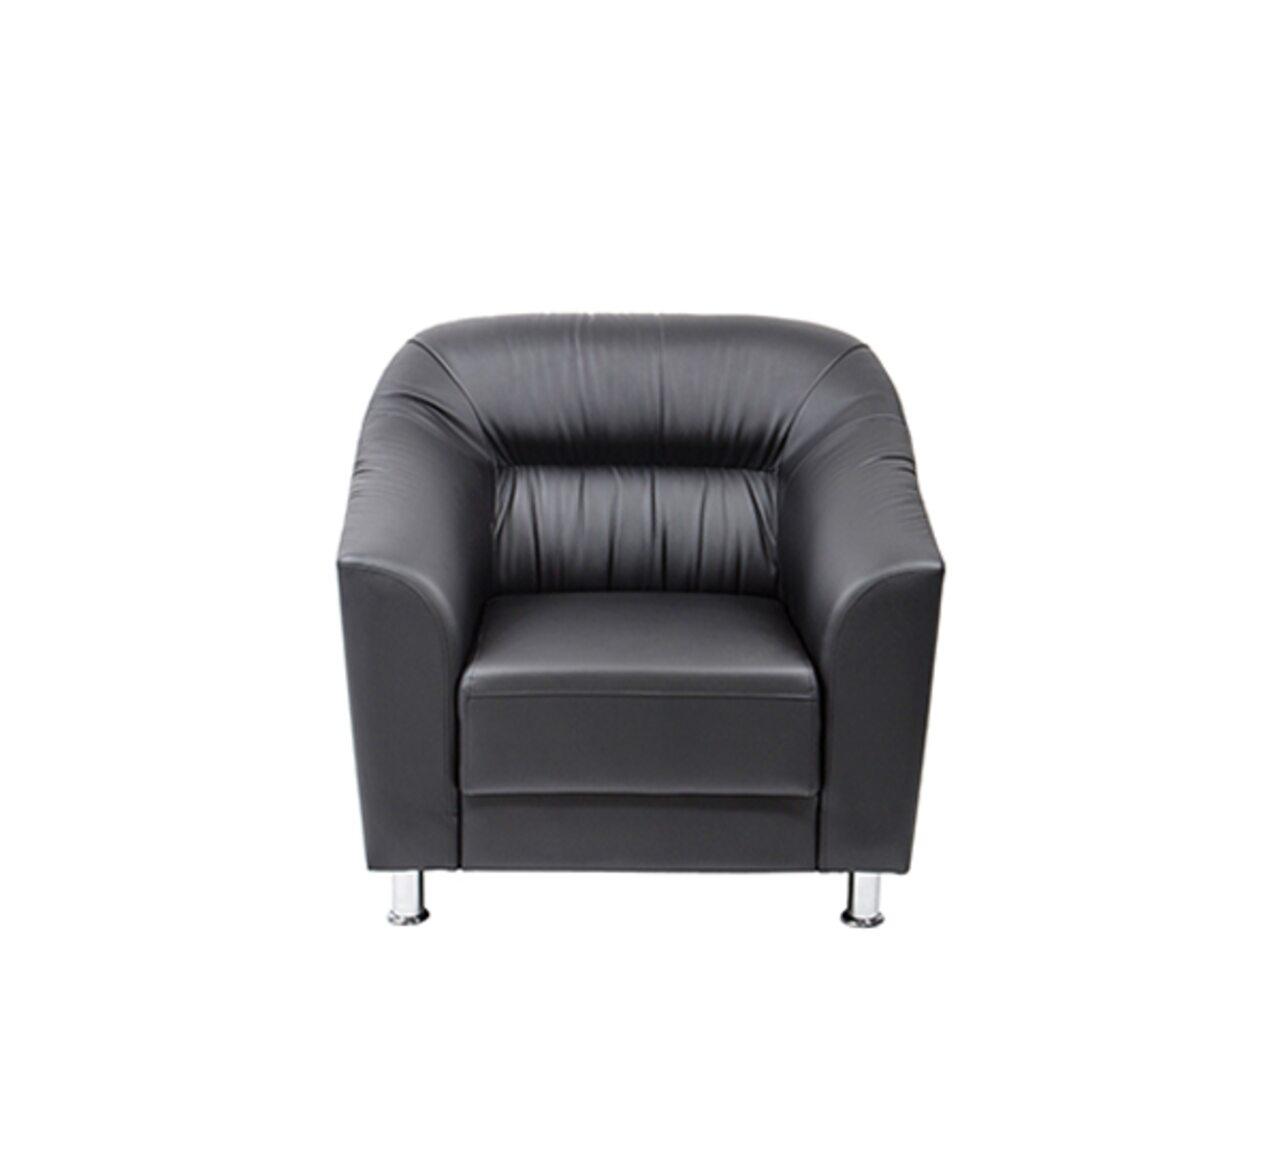 Кресло - фото 1